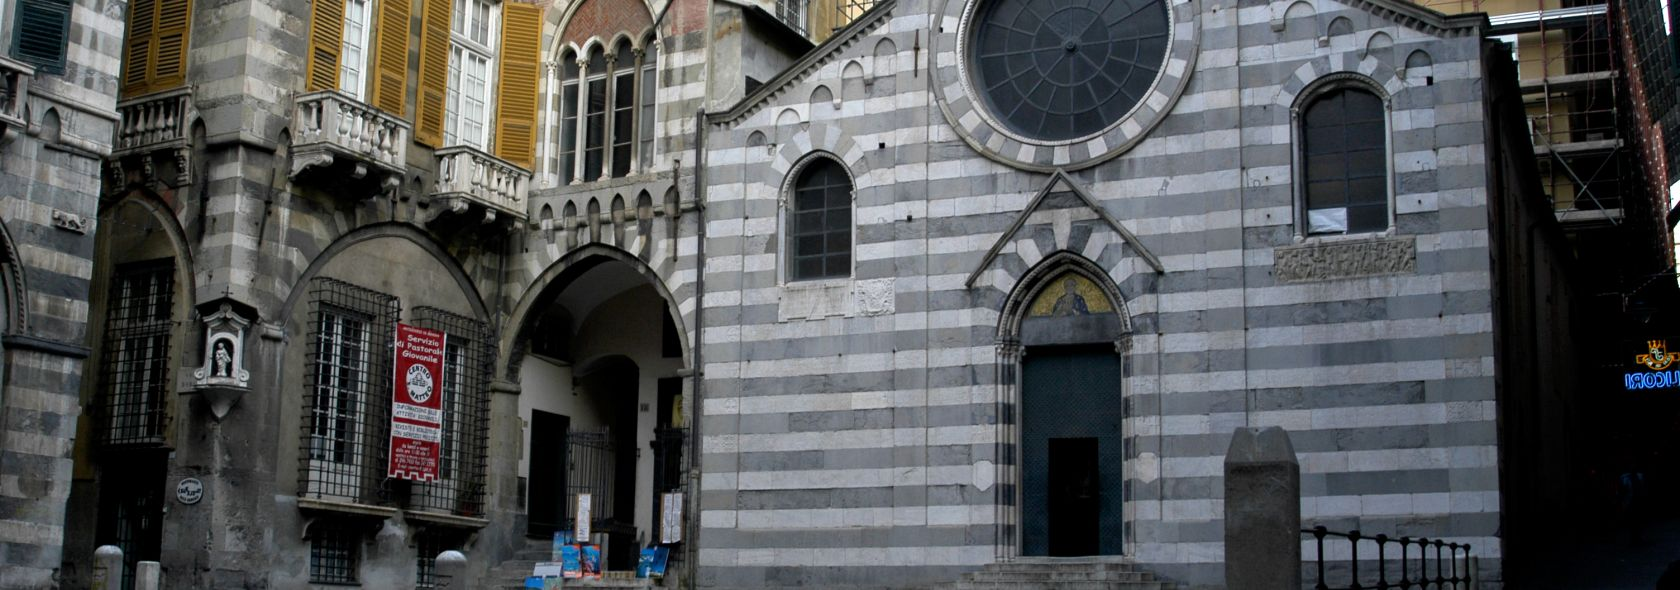 Abbazia di San Matteo